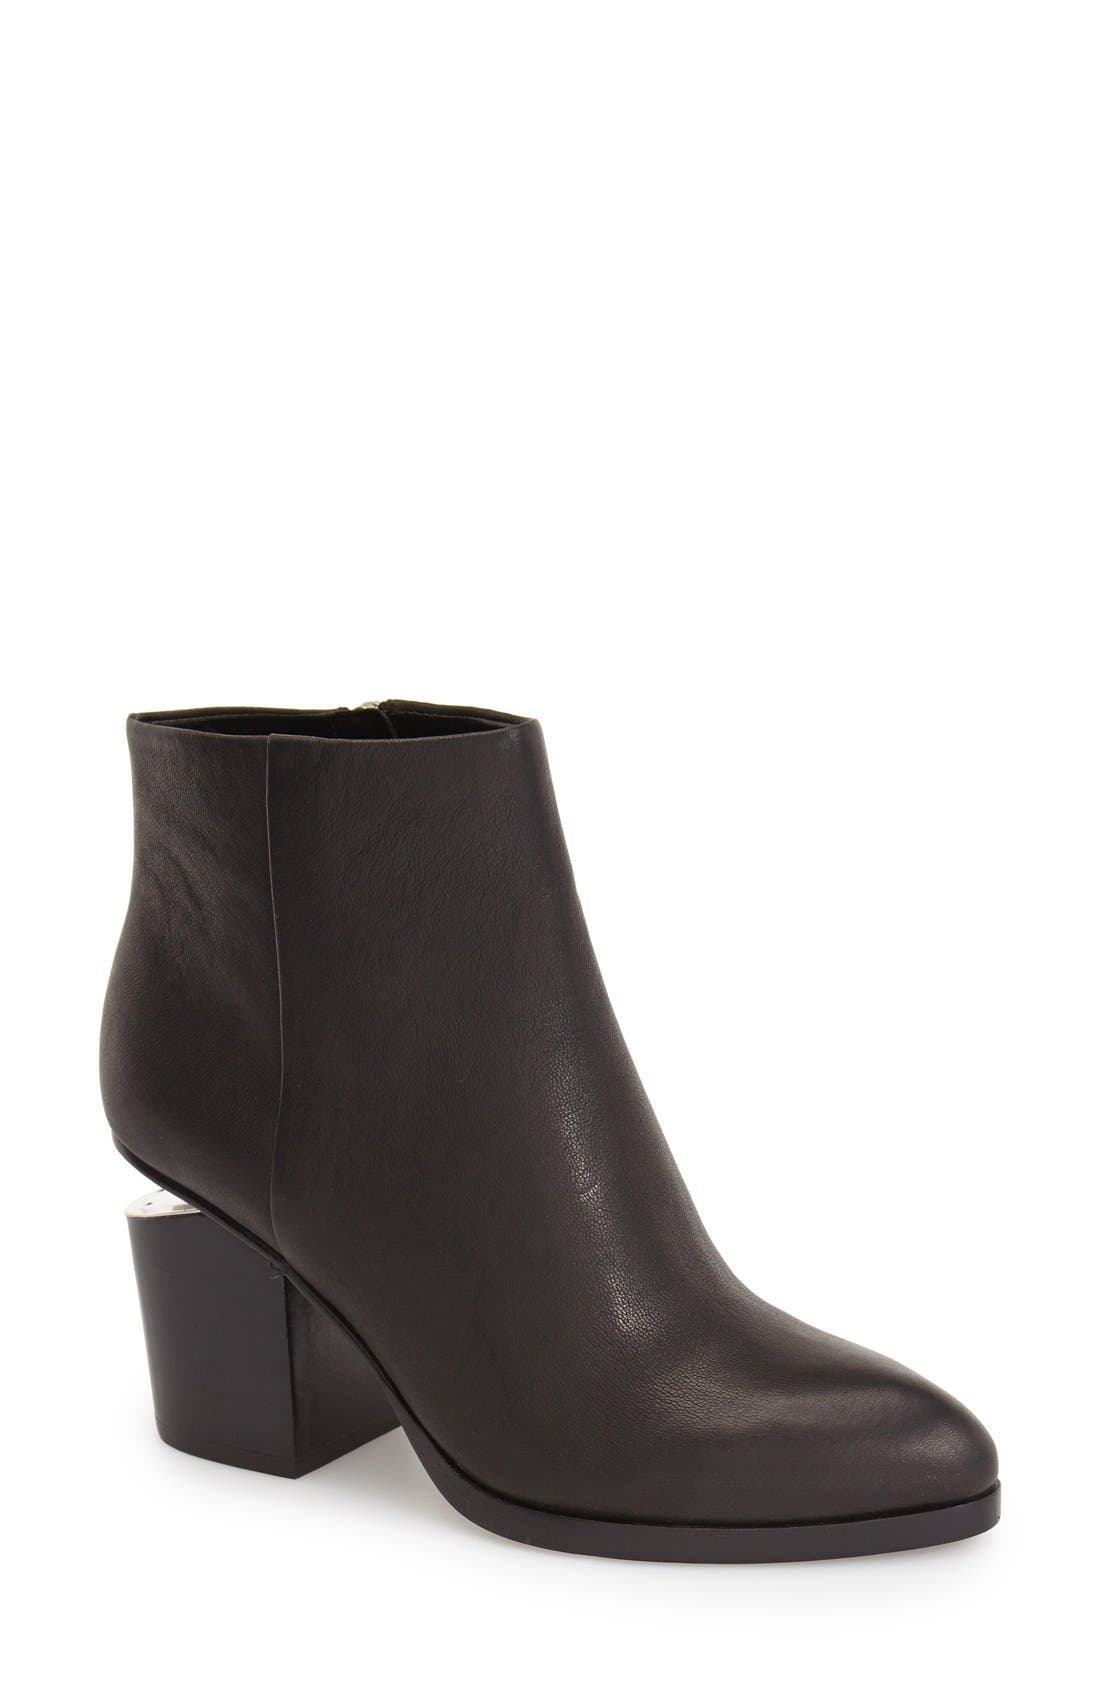 Gabi Leather Bootie,                         Main,                         color, BLACK LEATHER/ SILVER